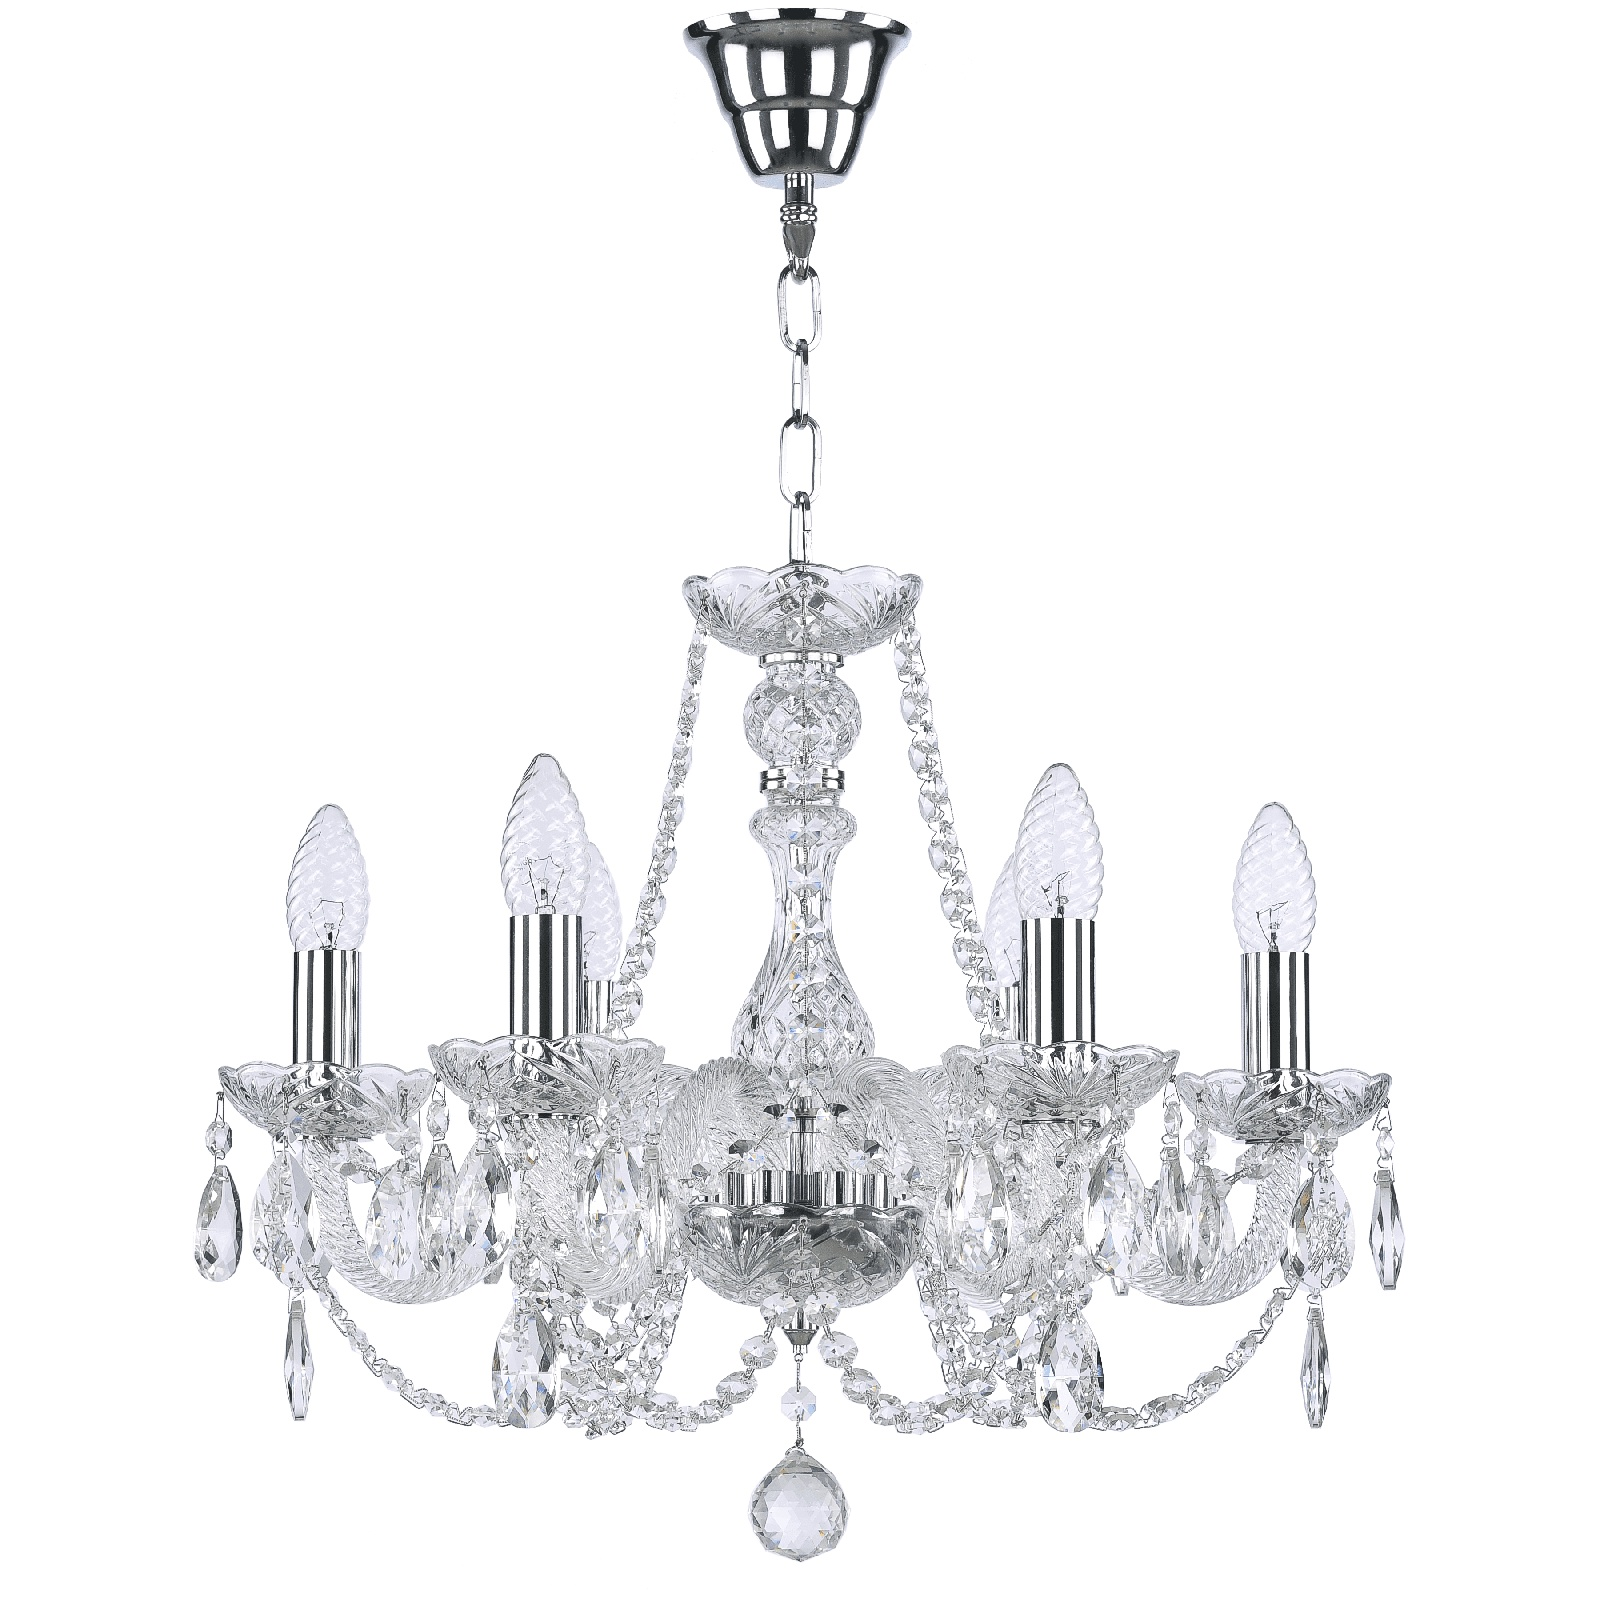 Потолочный светильник Bohemia Classic Light 101/6/165 NI, E14, 40W Вт